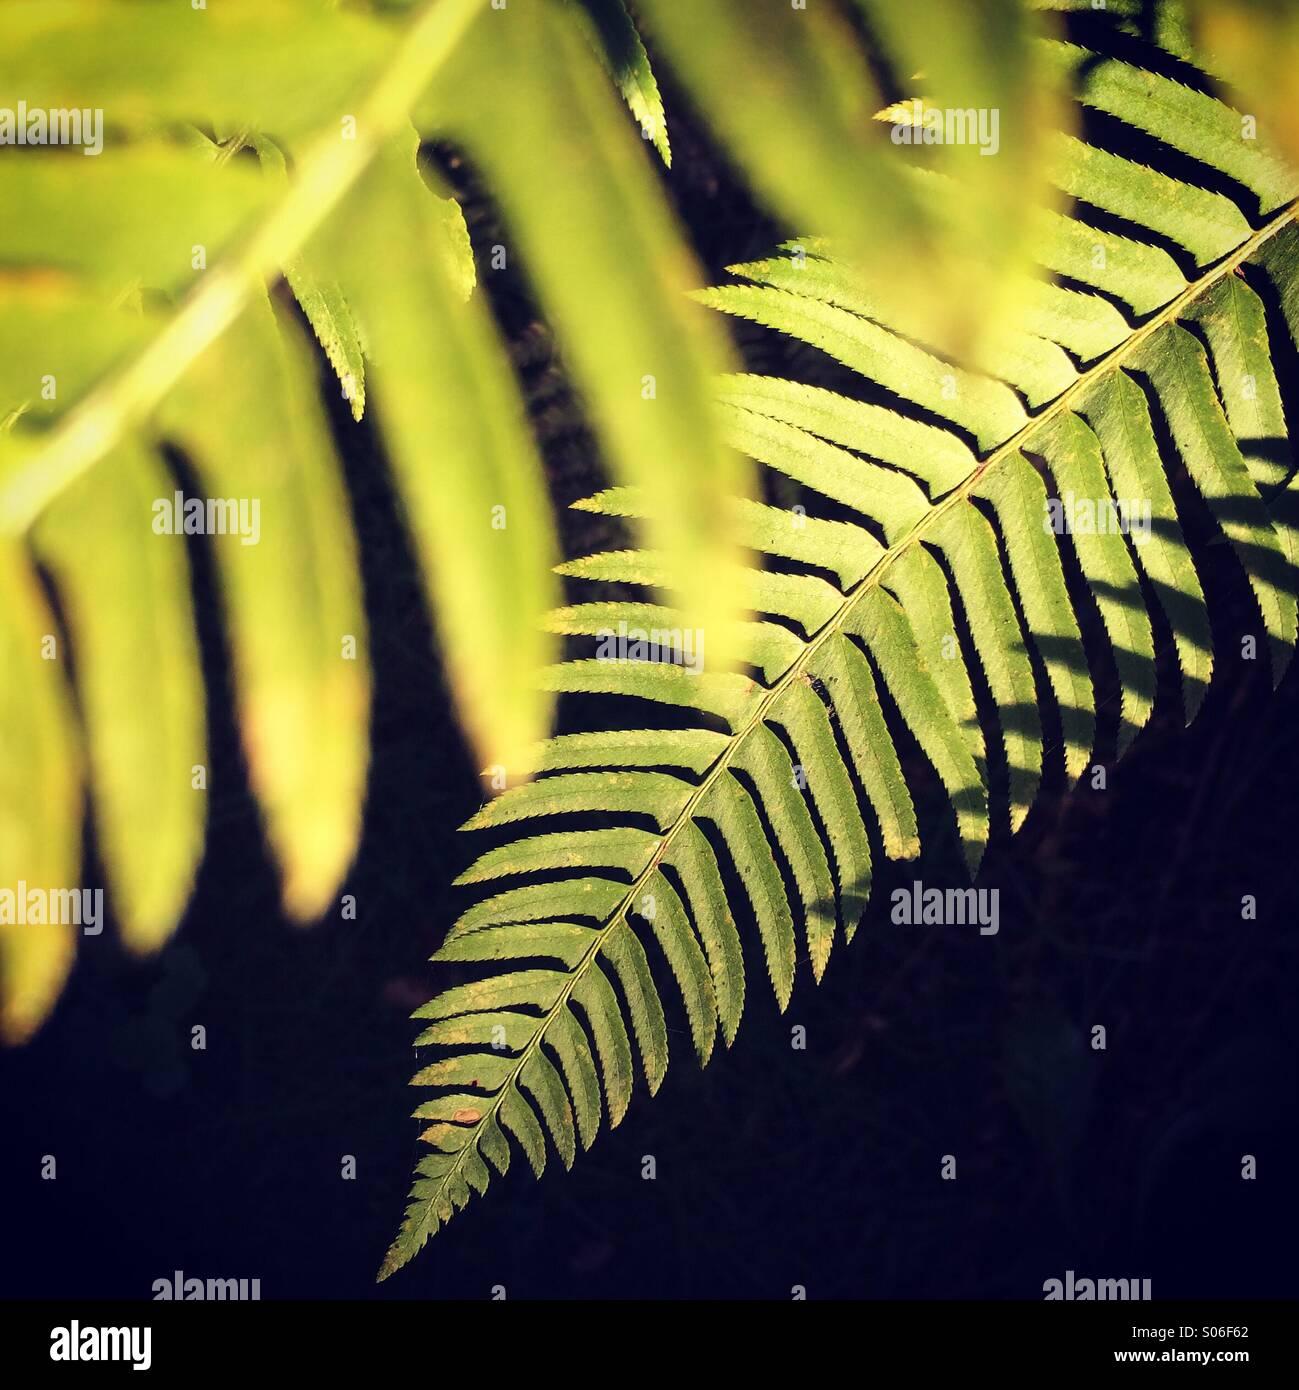 Fern fronds in sunlight, Key Peninsula, Kopachuck State Park, Washington State - Stock Image